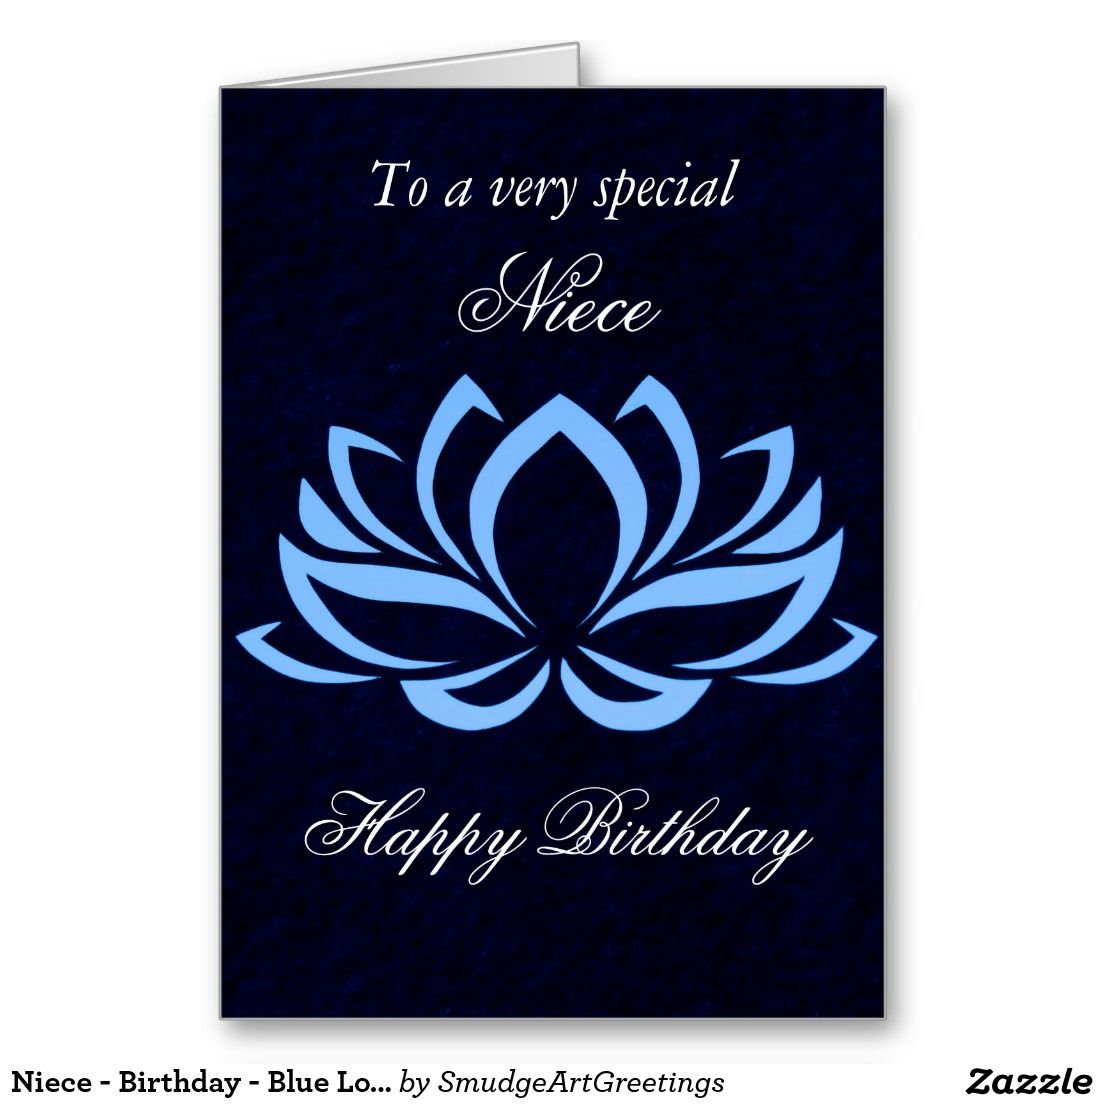 Niece Birthday Blue Lotus On Black Card Zazzle Com In 2021 Lotus Japanese Lotus Small Gift Bags [ 1104 x 1104 Pixel ]